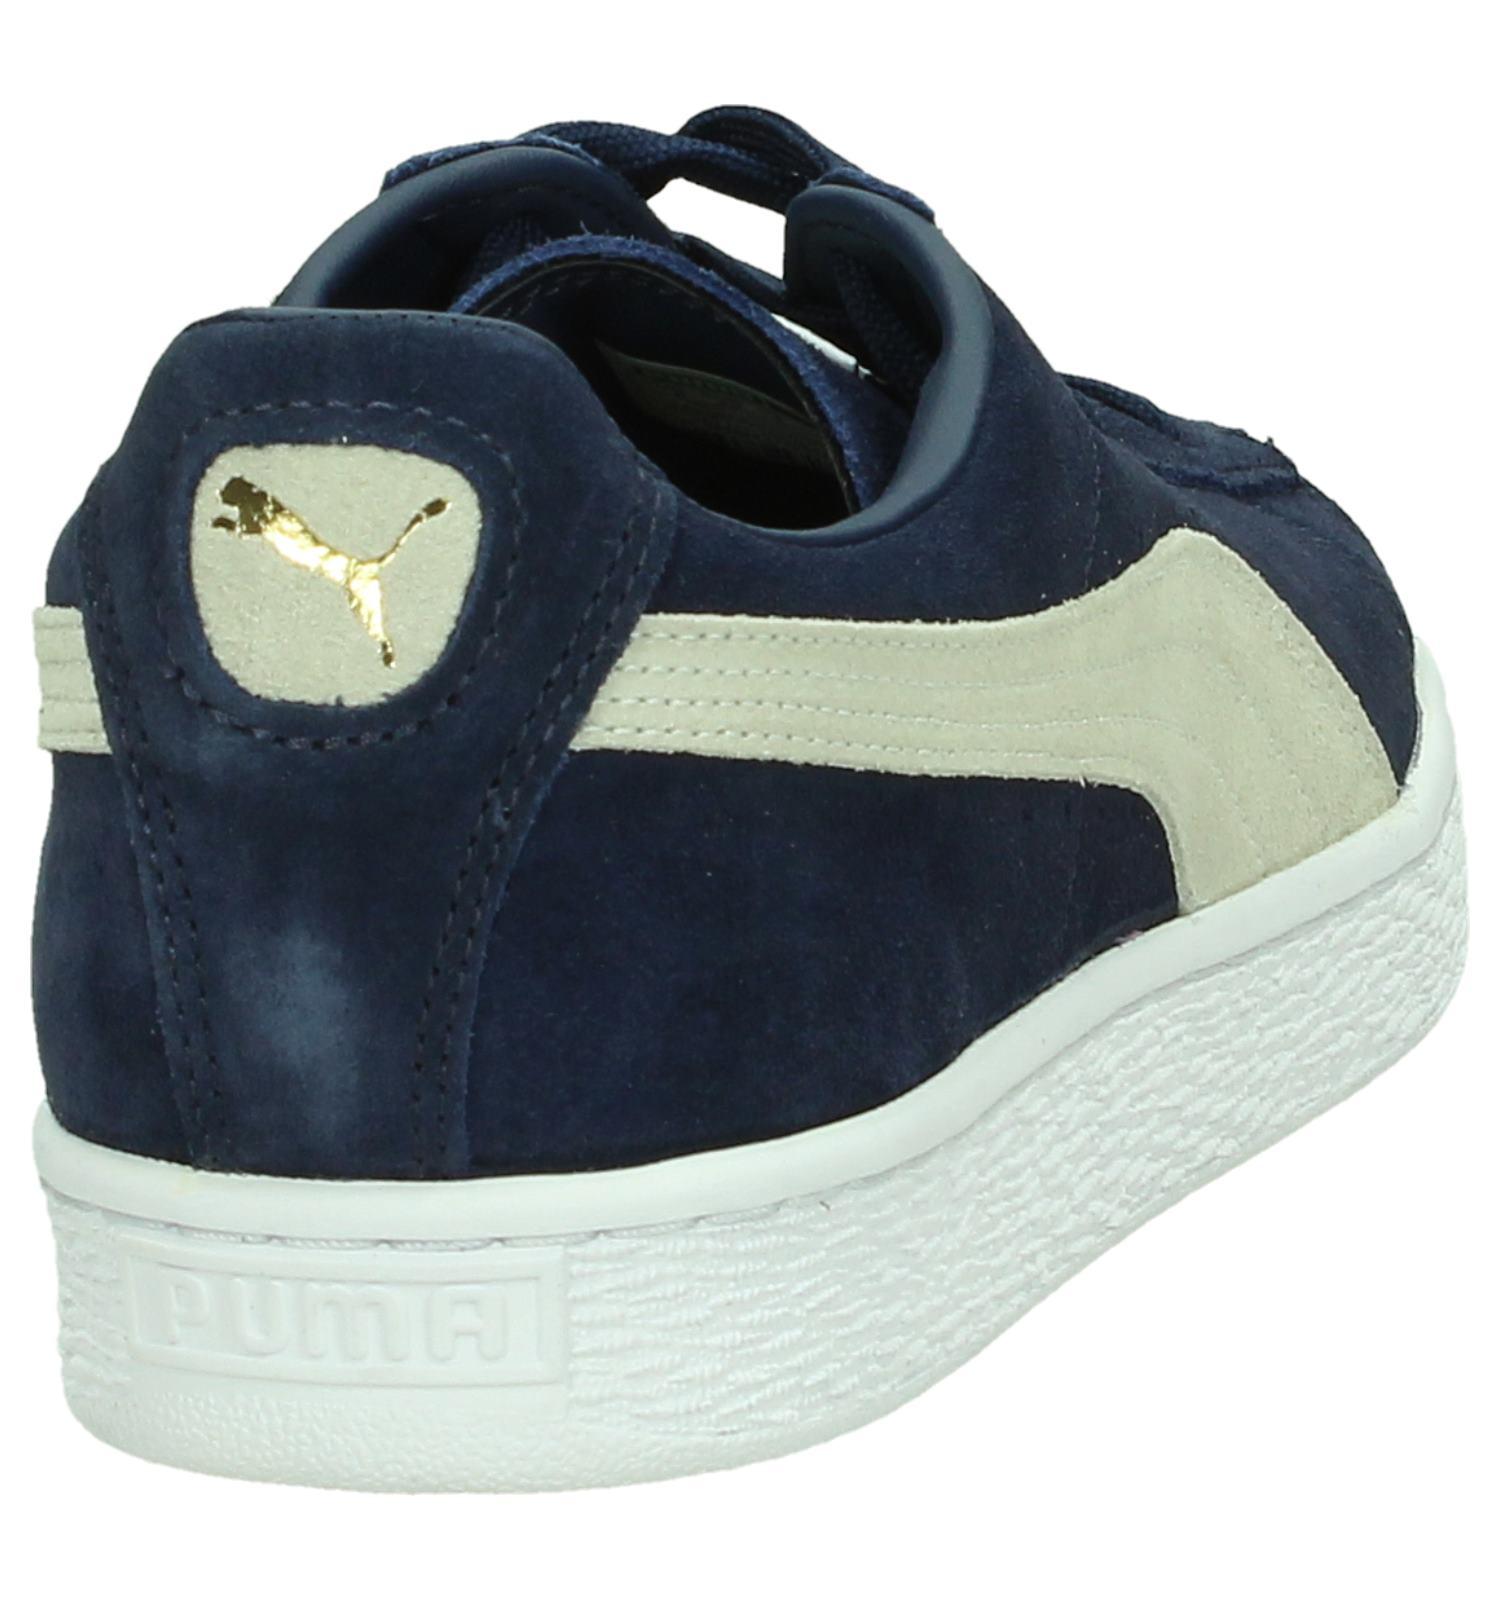 30766d25b82 Blauwe Sneakers Puma Suede Classic | TORFS.BE | Gratis verzend en retour